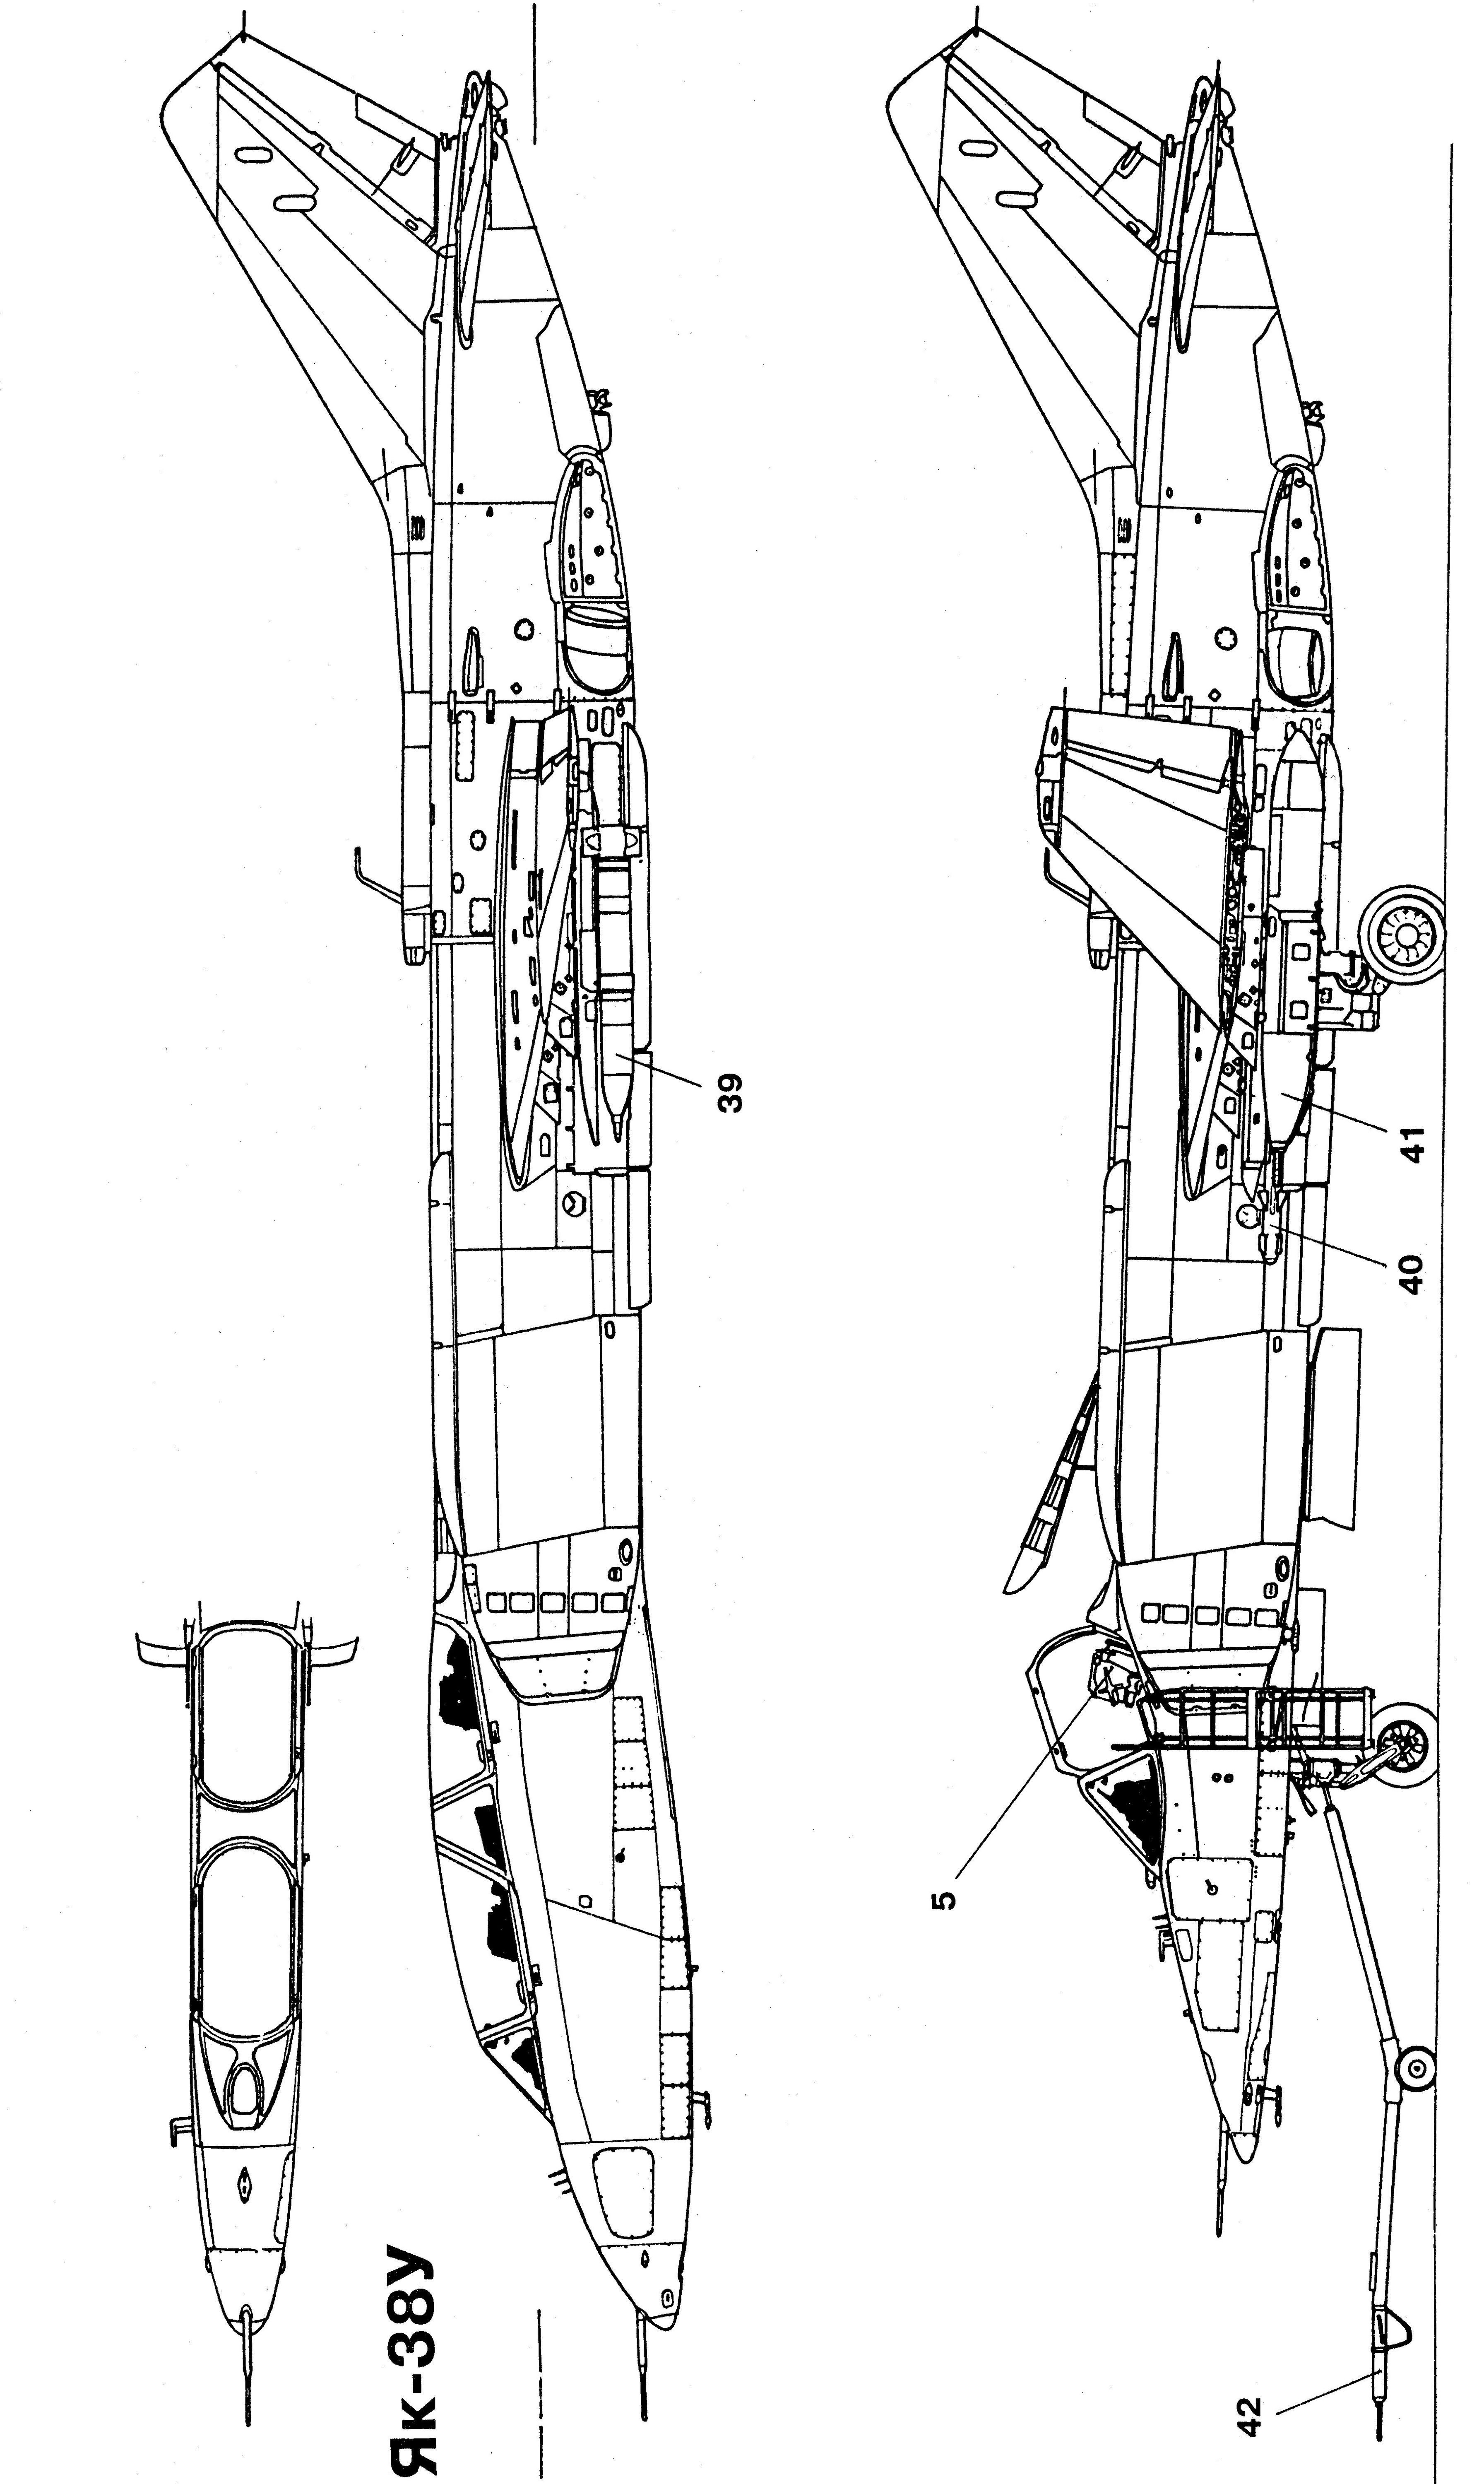 Airplane Engine Diagram Yakovlev Yak 38 Blueprint Download Free Blueprint for 3d Of Airplane Engine Diagram